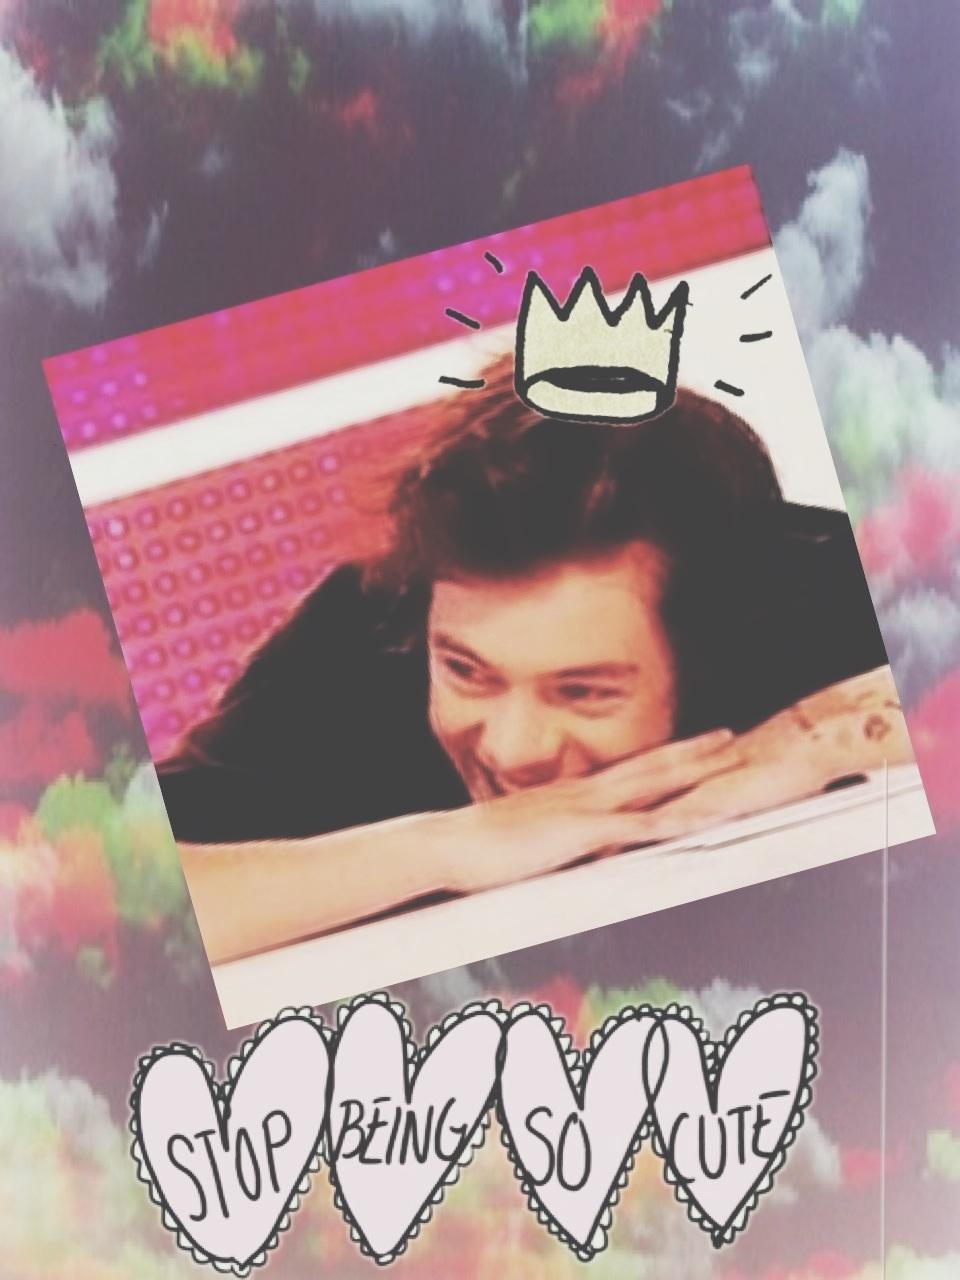 Harry Styles Tumblr 2014 Edits